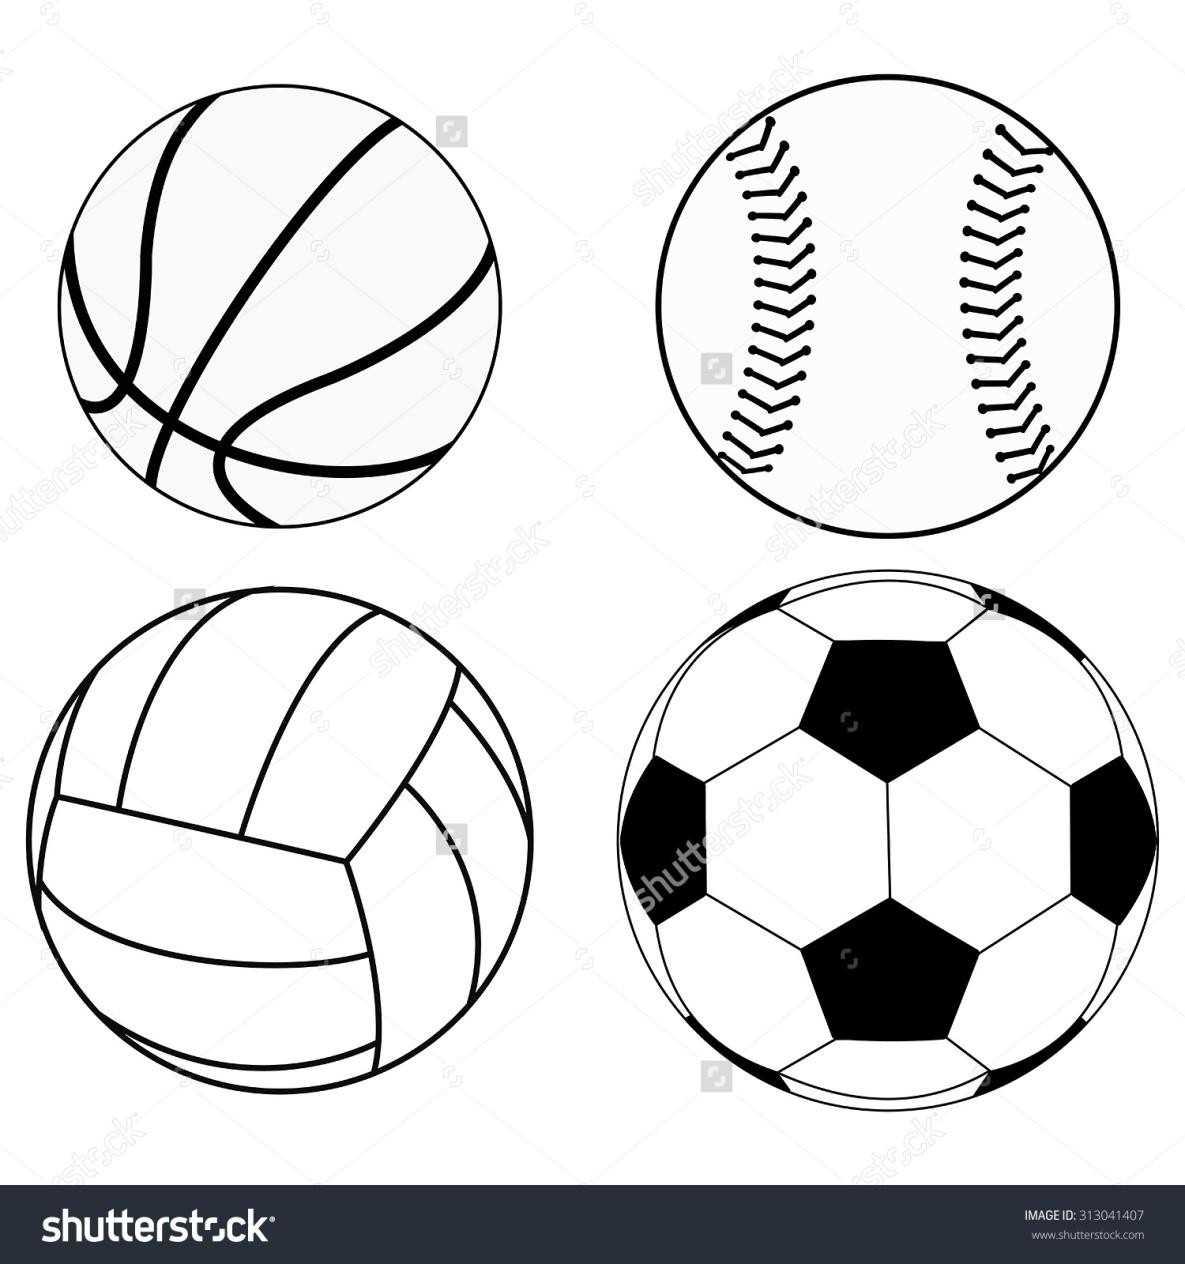 1185x1264 Soccer Ball Sketch Easy Design Decoration Ideas